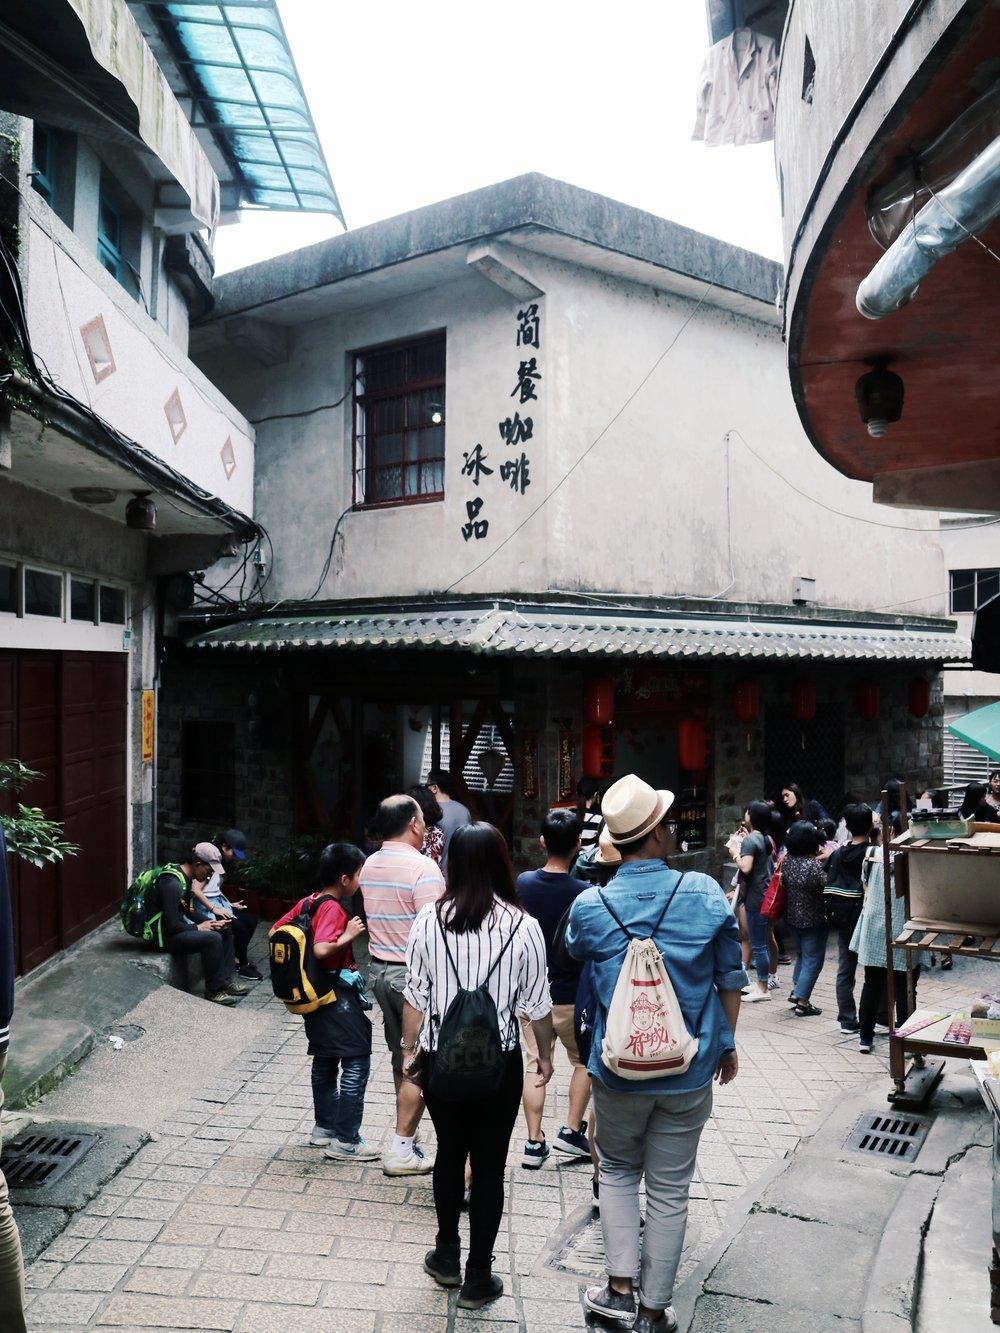 平溪老街 - PING XI OLD STREET